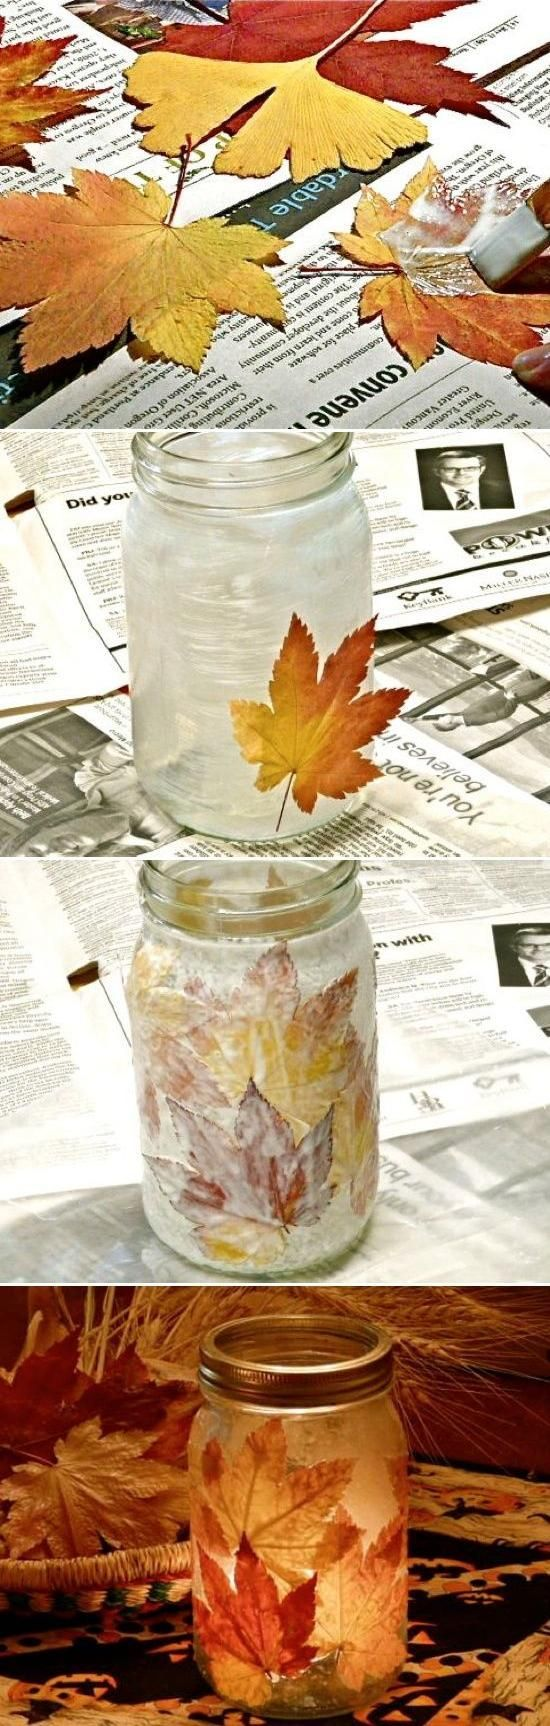 Herbstdeko basteln mit Blättern - Herbst-Kerzenglas